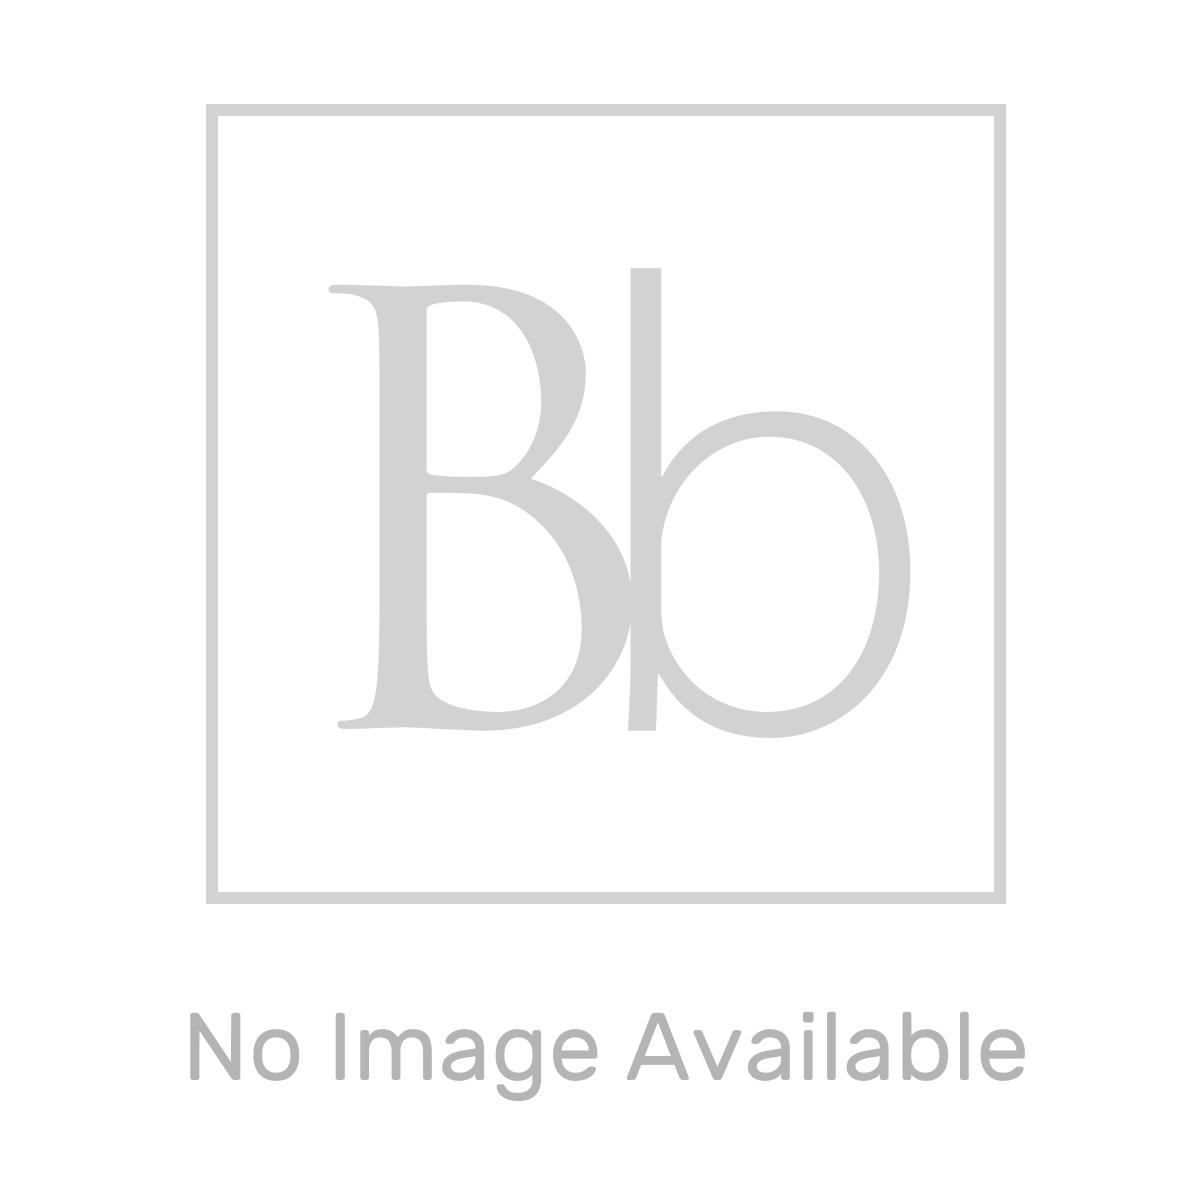 Aquadart Grey Slate Shower Tray 1700 x 700